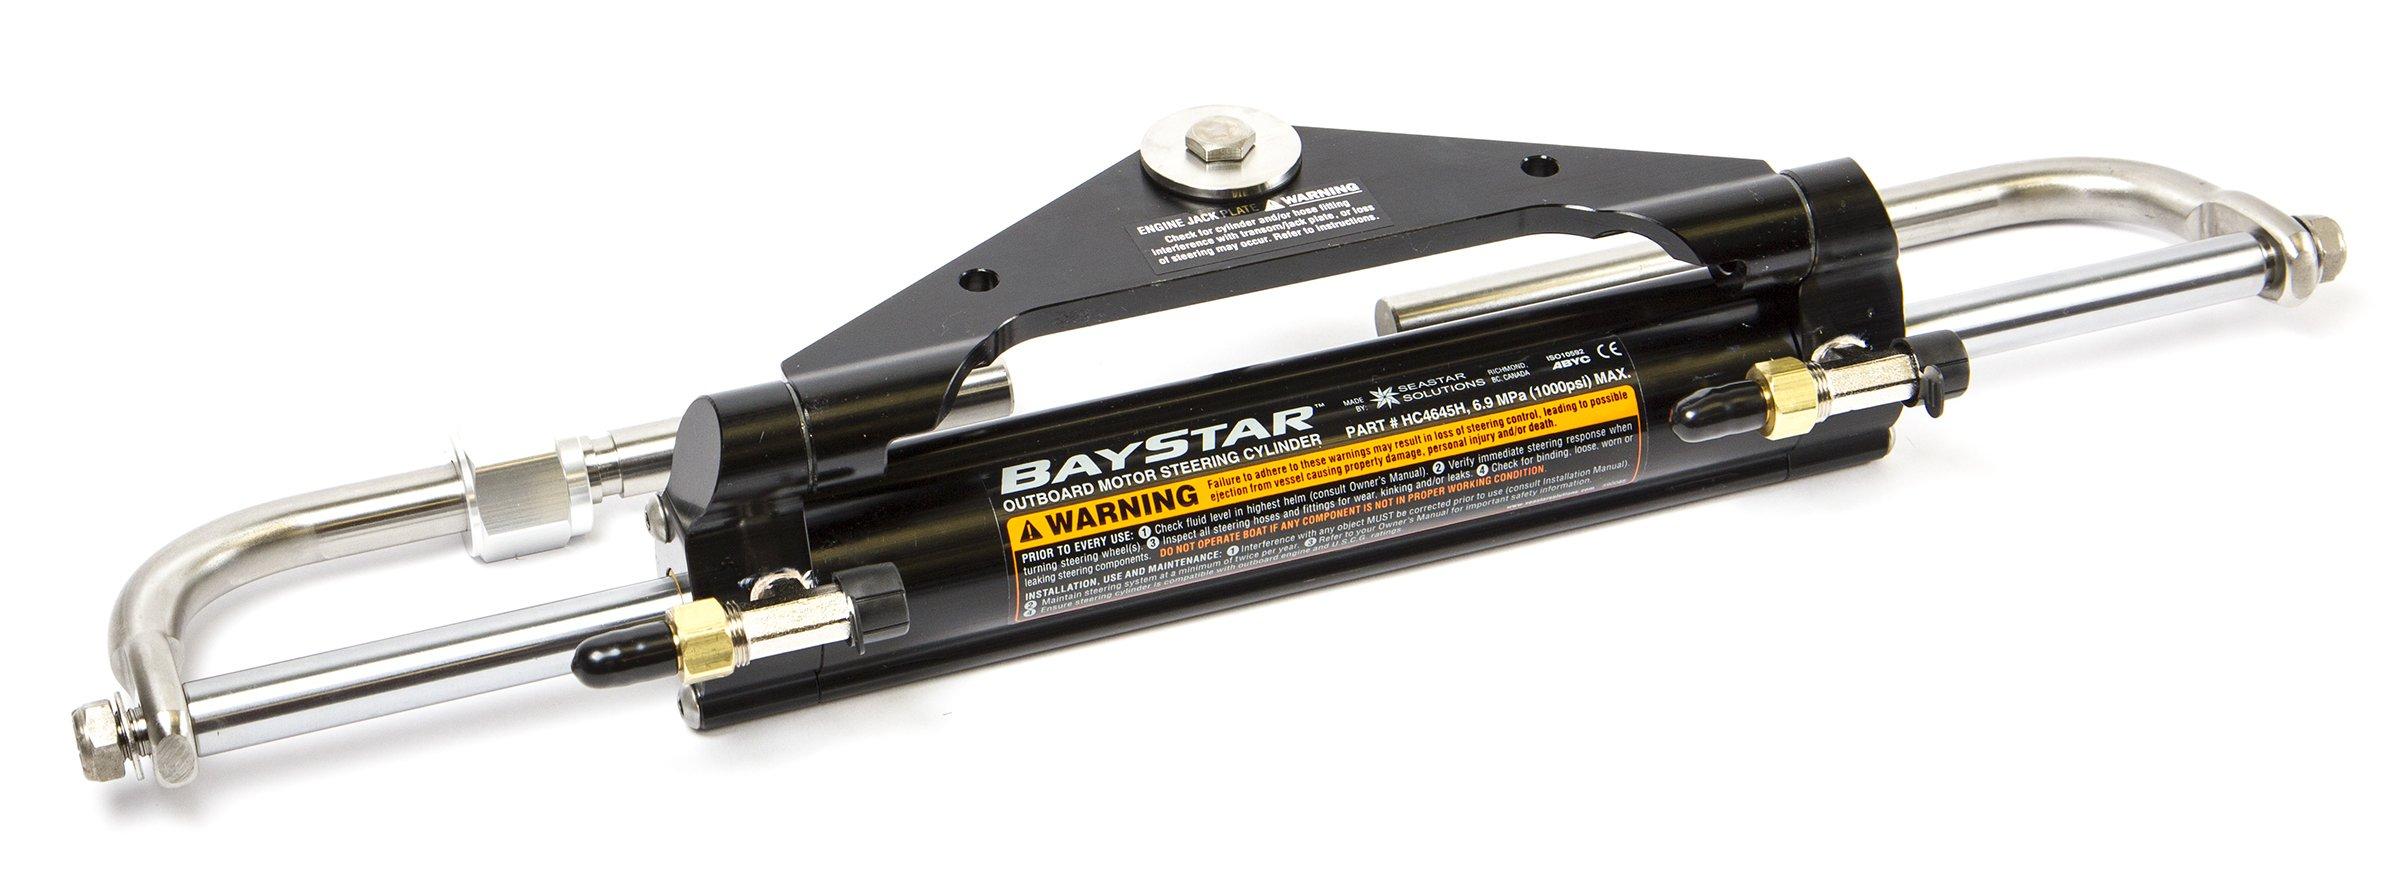 Baystar Compact Cylinder HC4645H